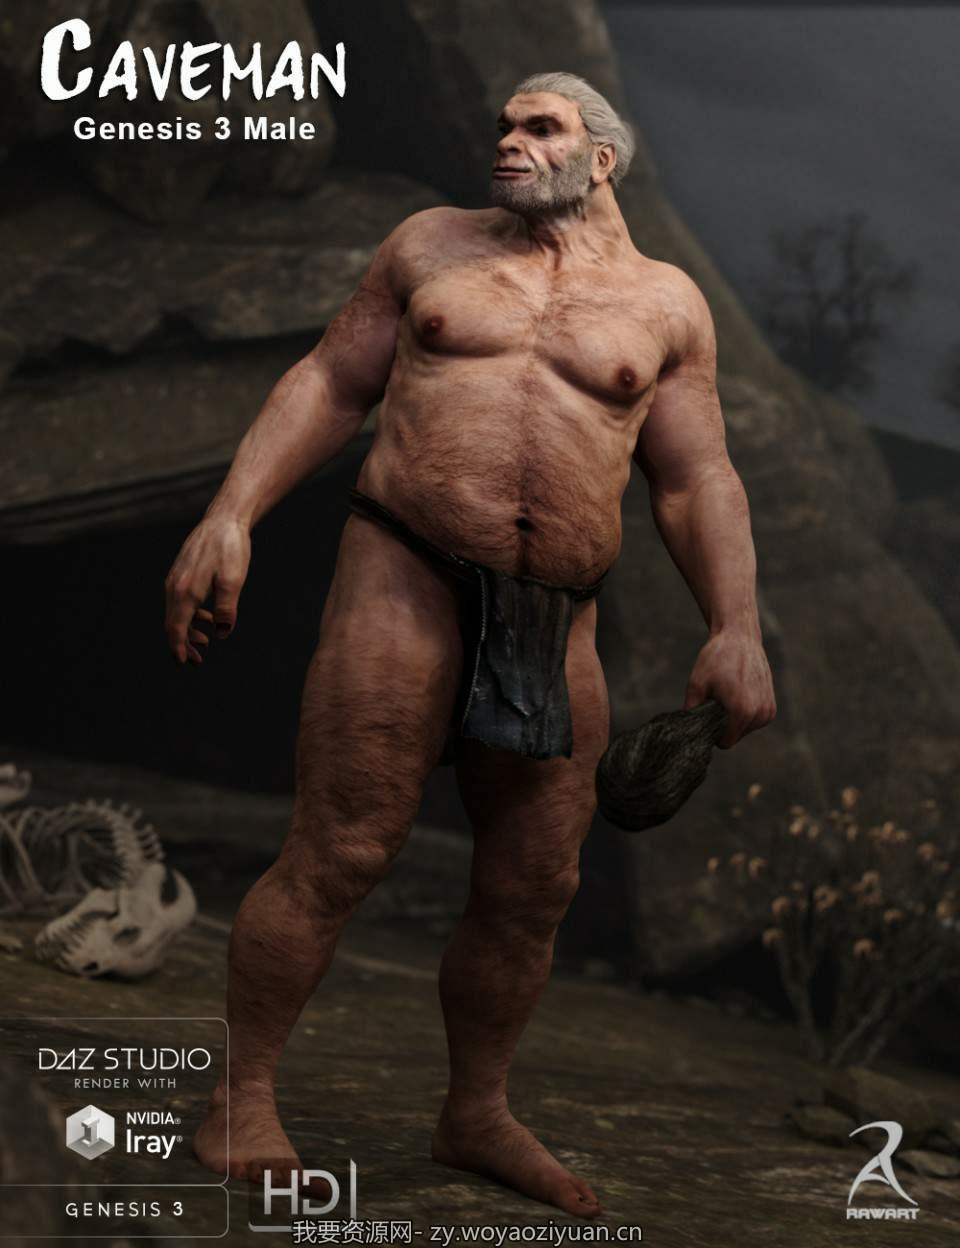 Caveman for Genesis 3 Male